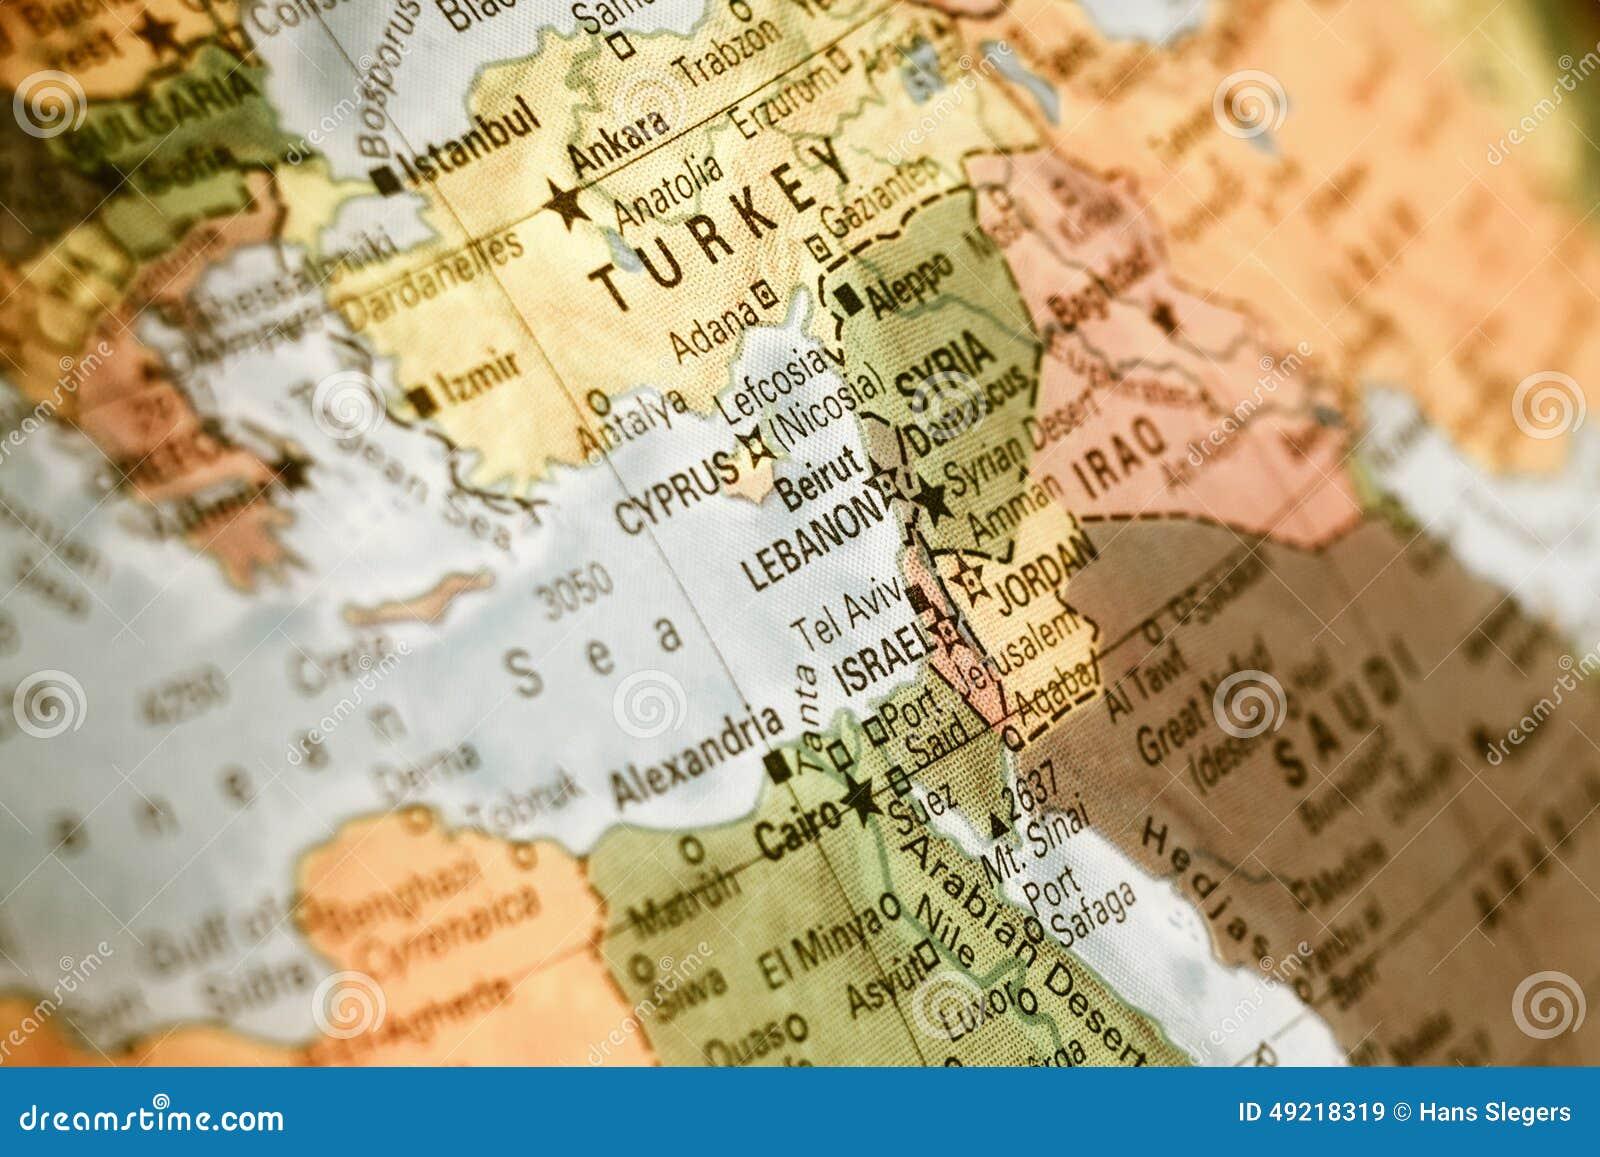 Map of israel turkeyjordan lebanon stock image image of closeup download comp gumiabroncs Choice Image